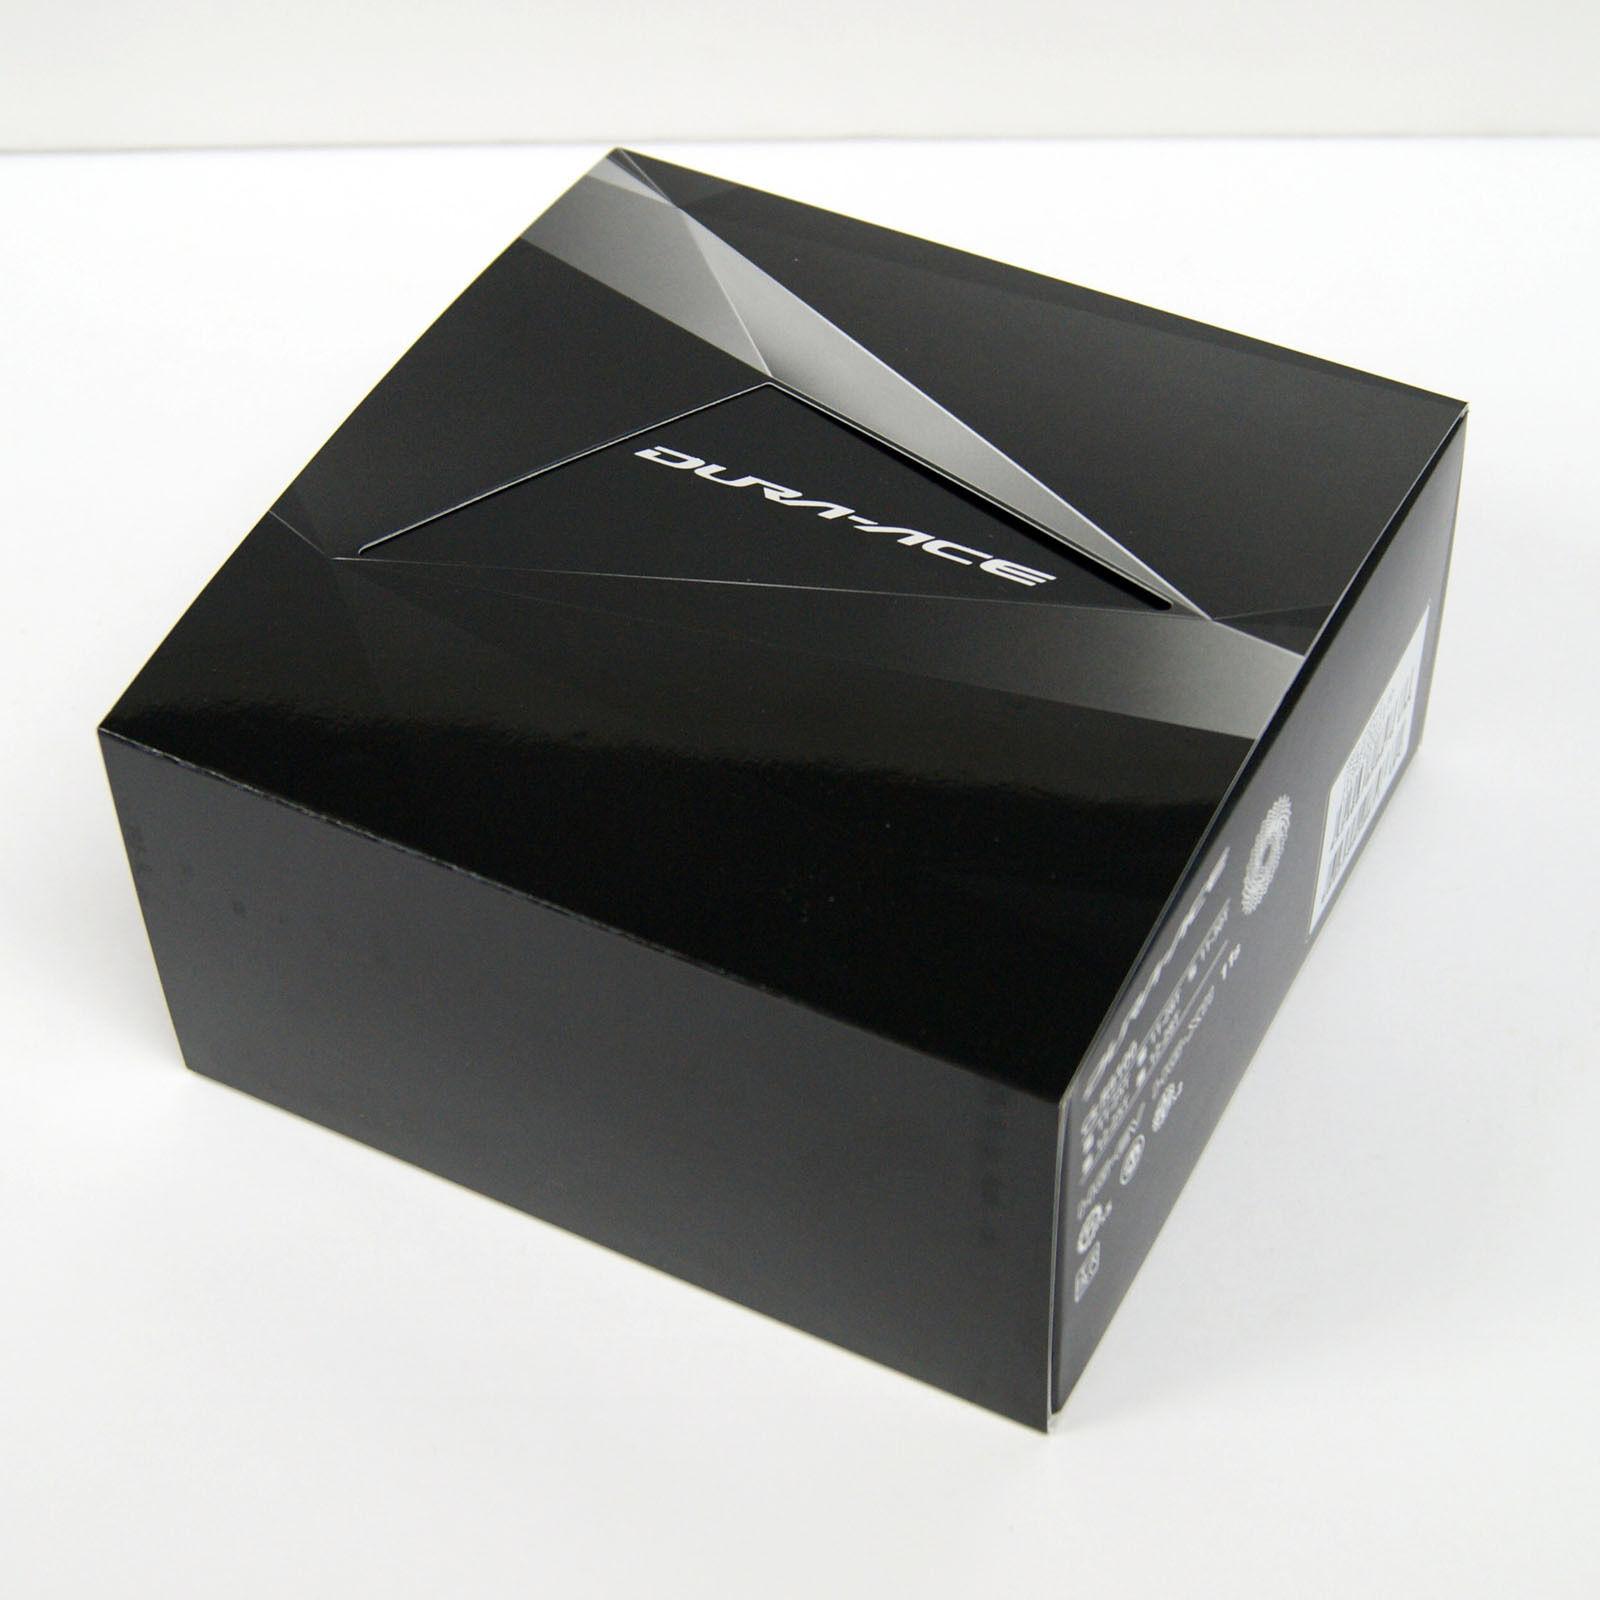 Shimano Dura-Ace CS-R9100 HG Cassette Sproket (11-30T)  ICSR910011130  find your favorite here